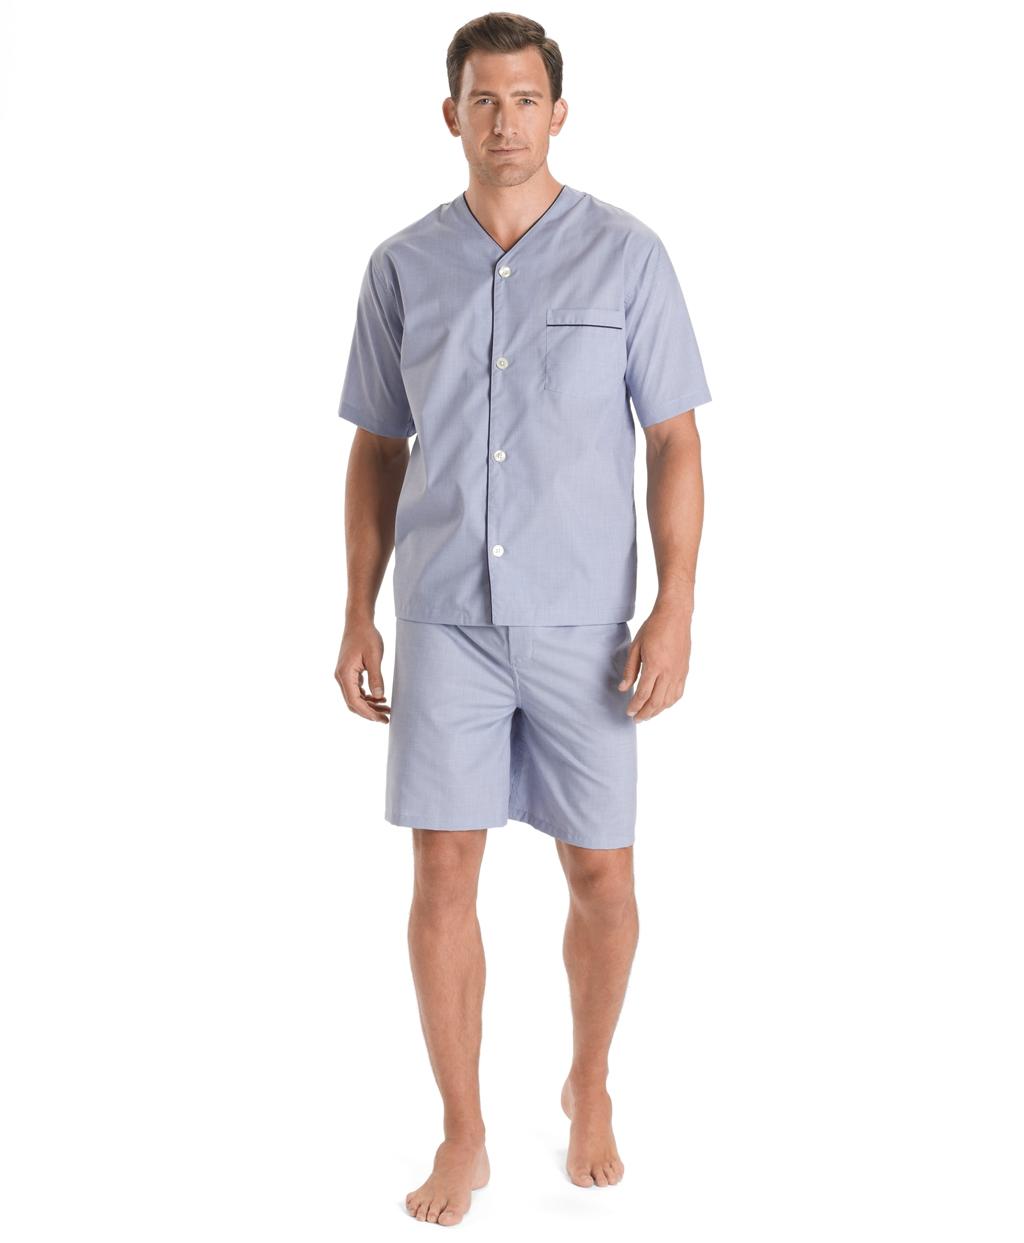 1940s Men's Underwear: Briefs, Boxers, Unions, & Socks Brooks Brothers Mens Wrinkle-Resistant Short Pajamas $55.65 AT vintagedancer.com